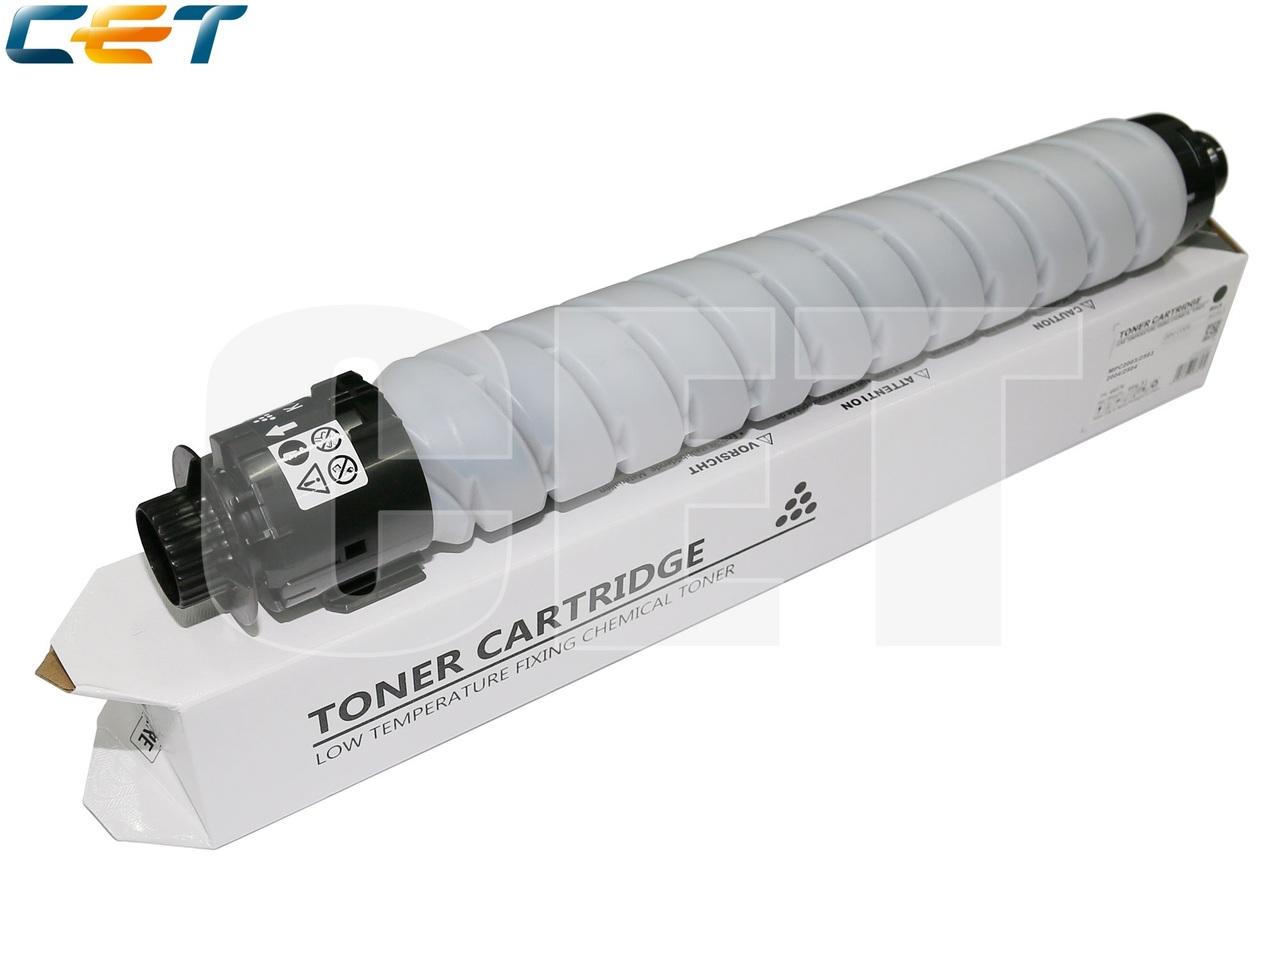 Тонер-картридж (CPP, CPT, HT8) 841925 для RICOHMPC2003/2004/2011SP (CET) Black, 285г, 15000 стр.,CET6856K